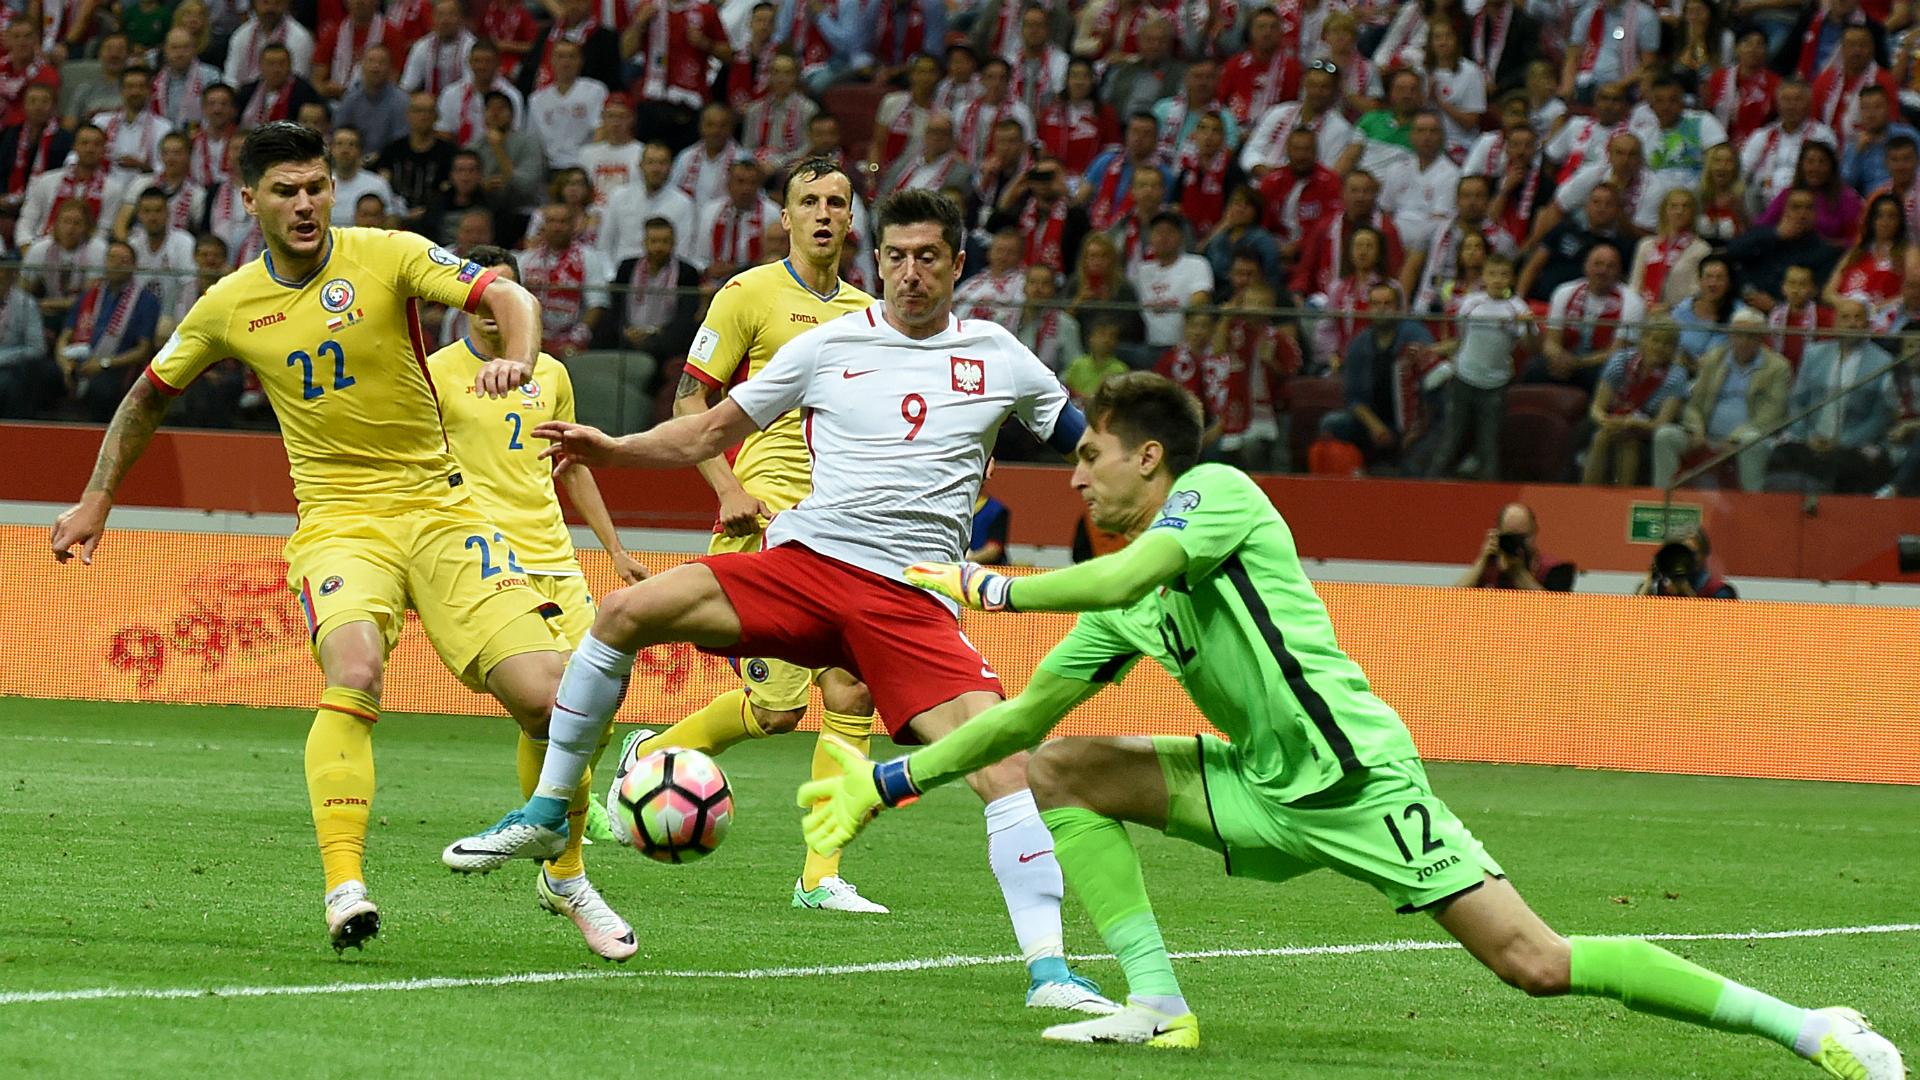 Rumania visita a Polonia antes del duelo con Chile — En vivo